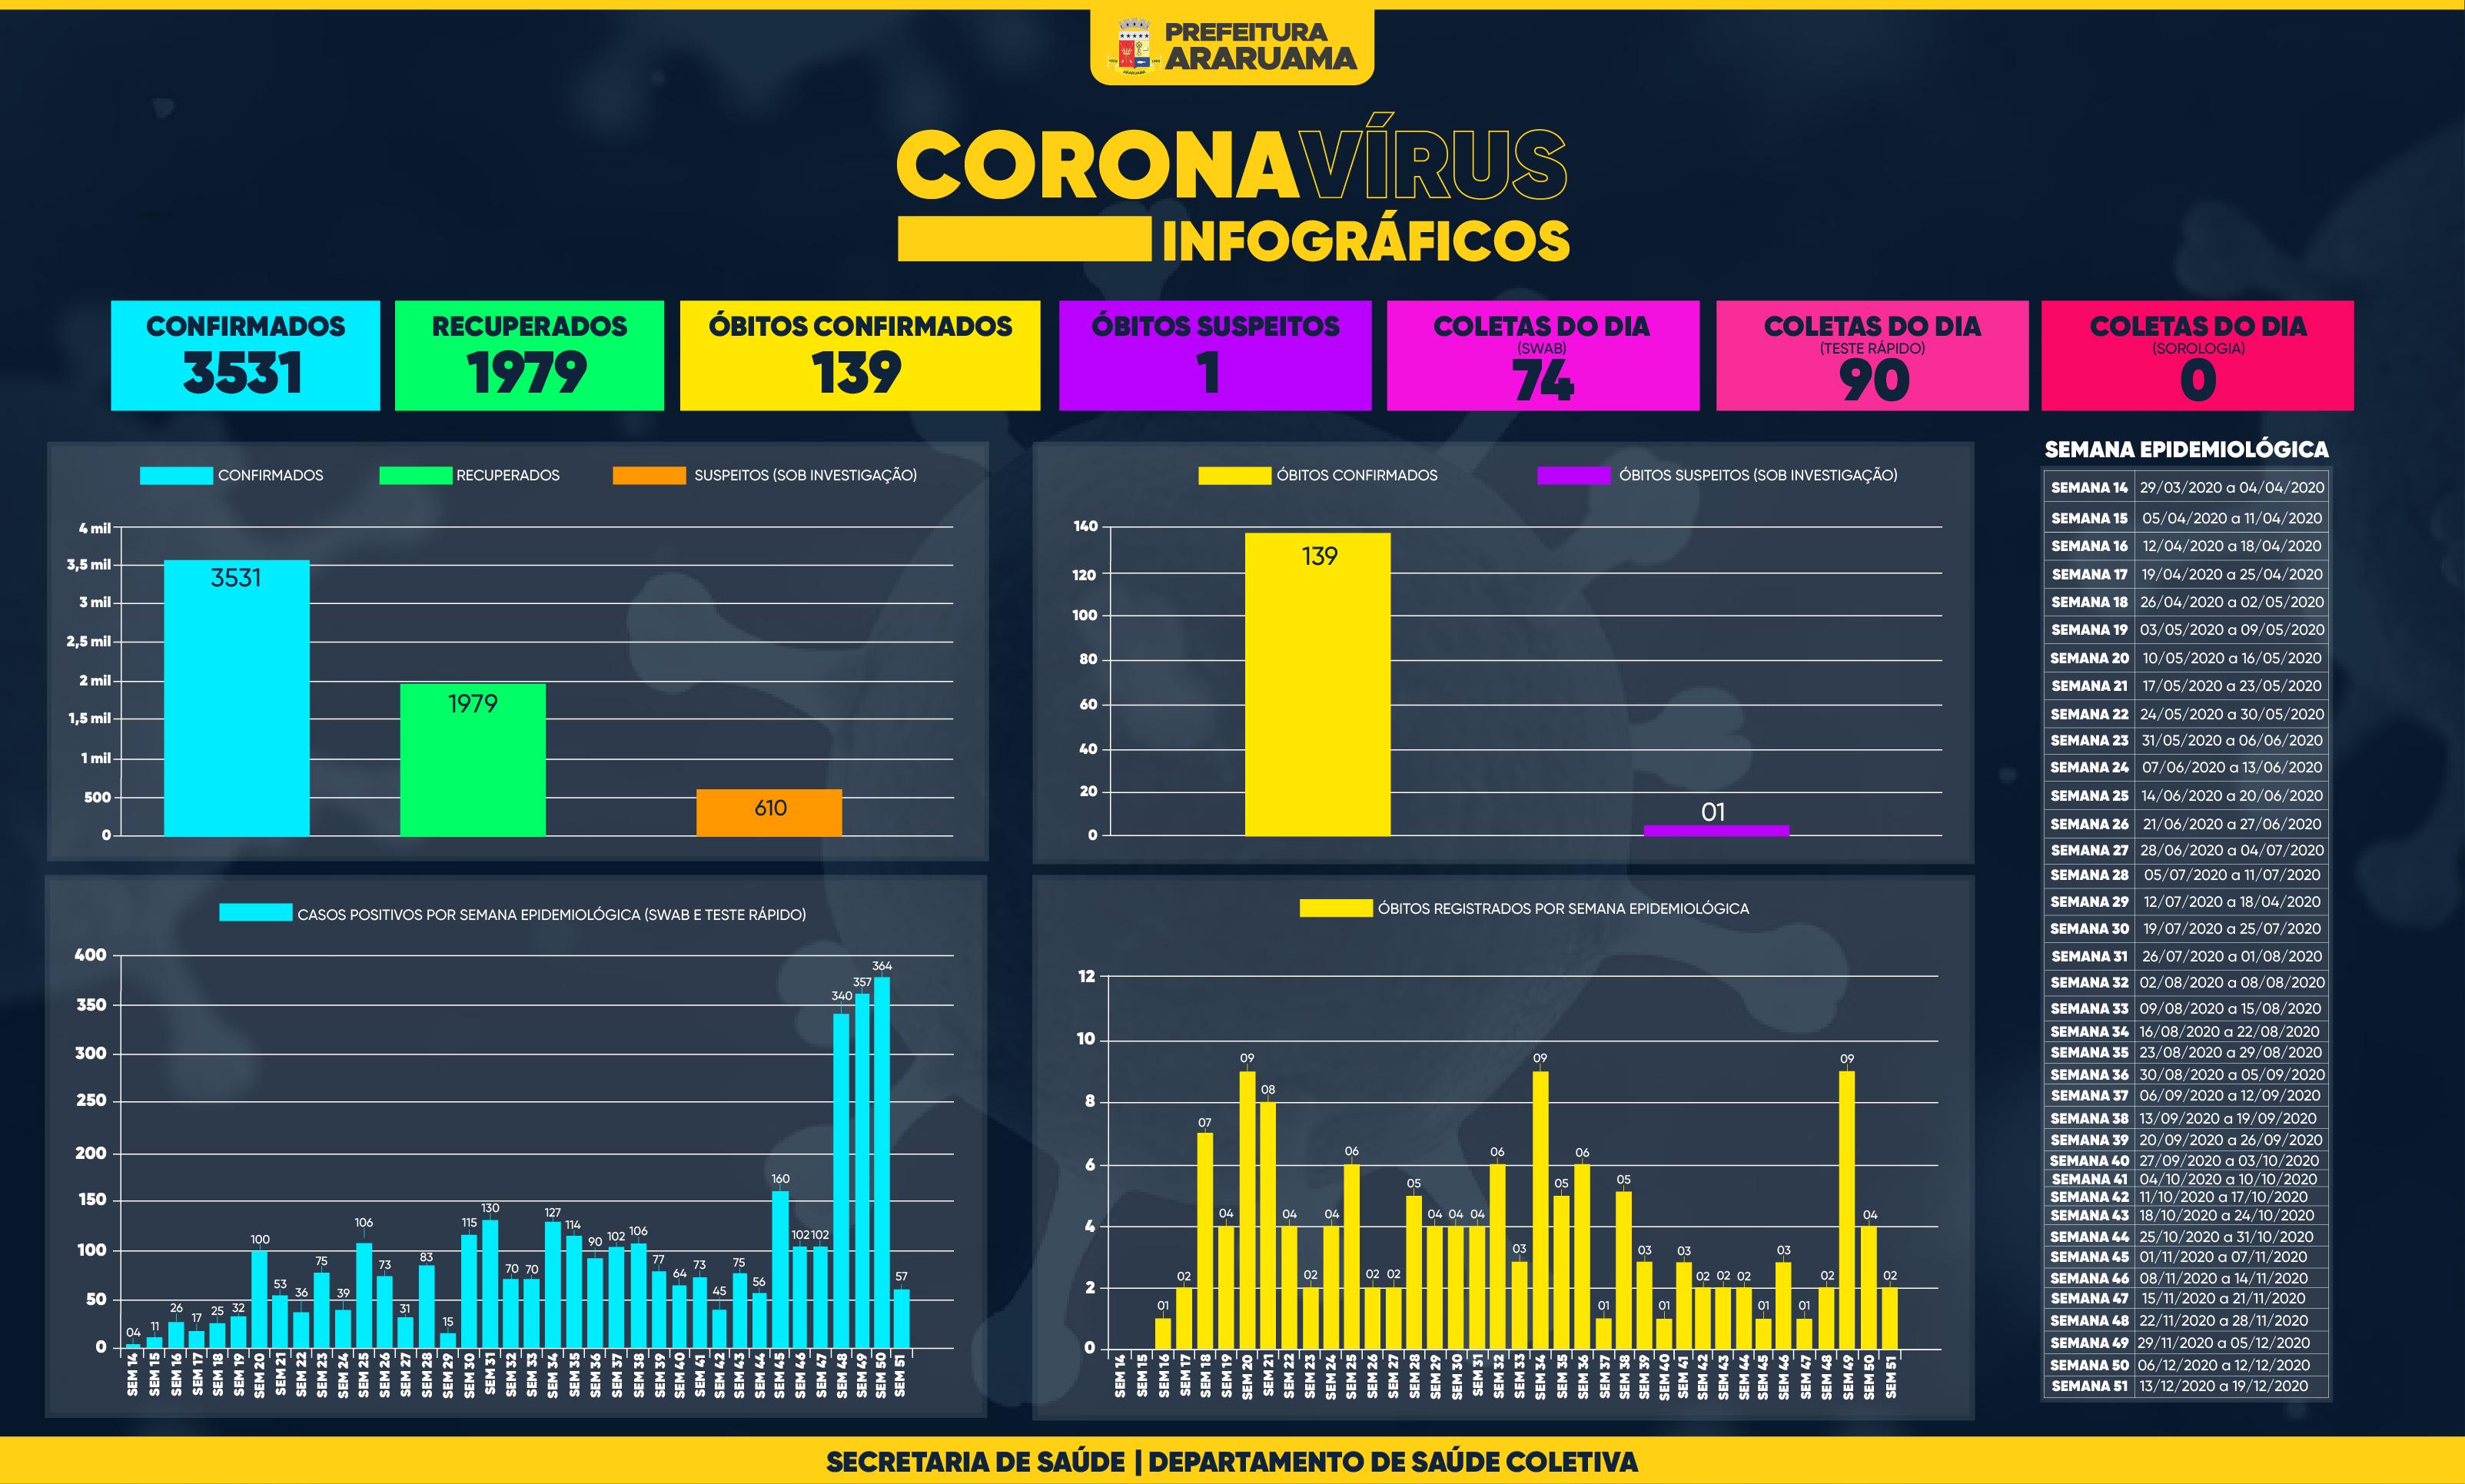 Painel de Monitoramento COVID-19 — Semana 51 — 18 de dezembro de 2020